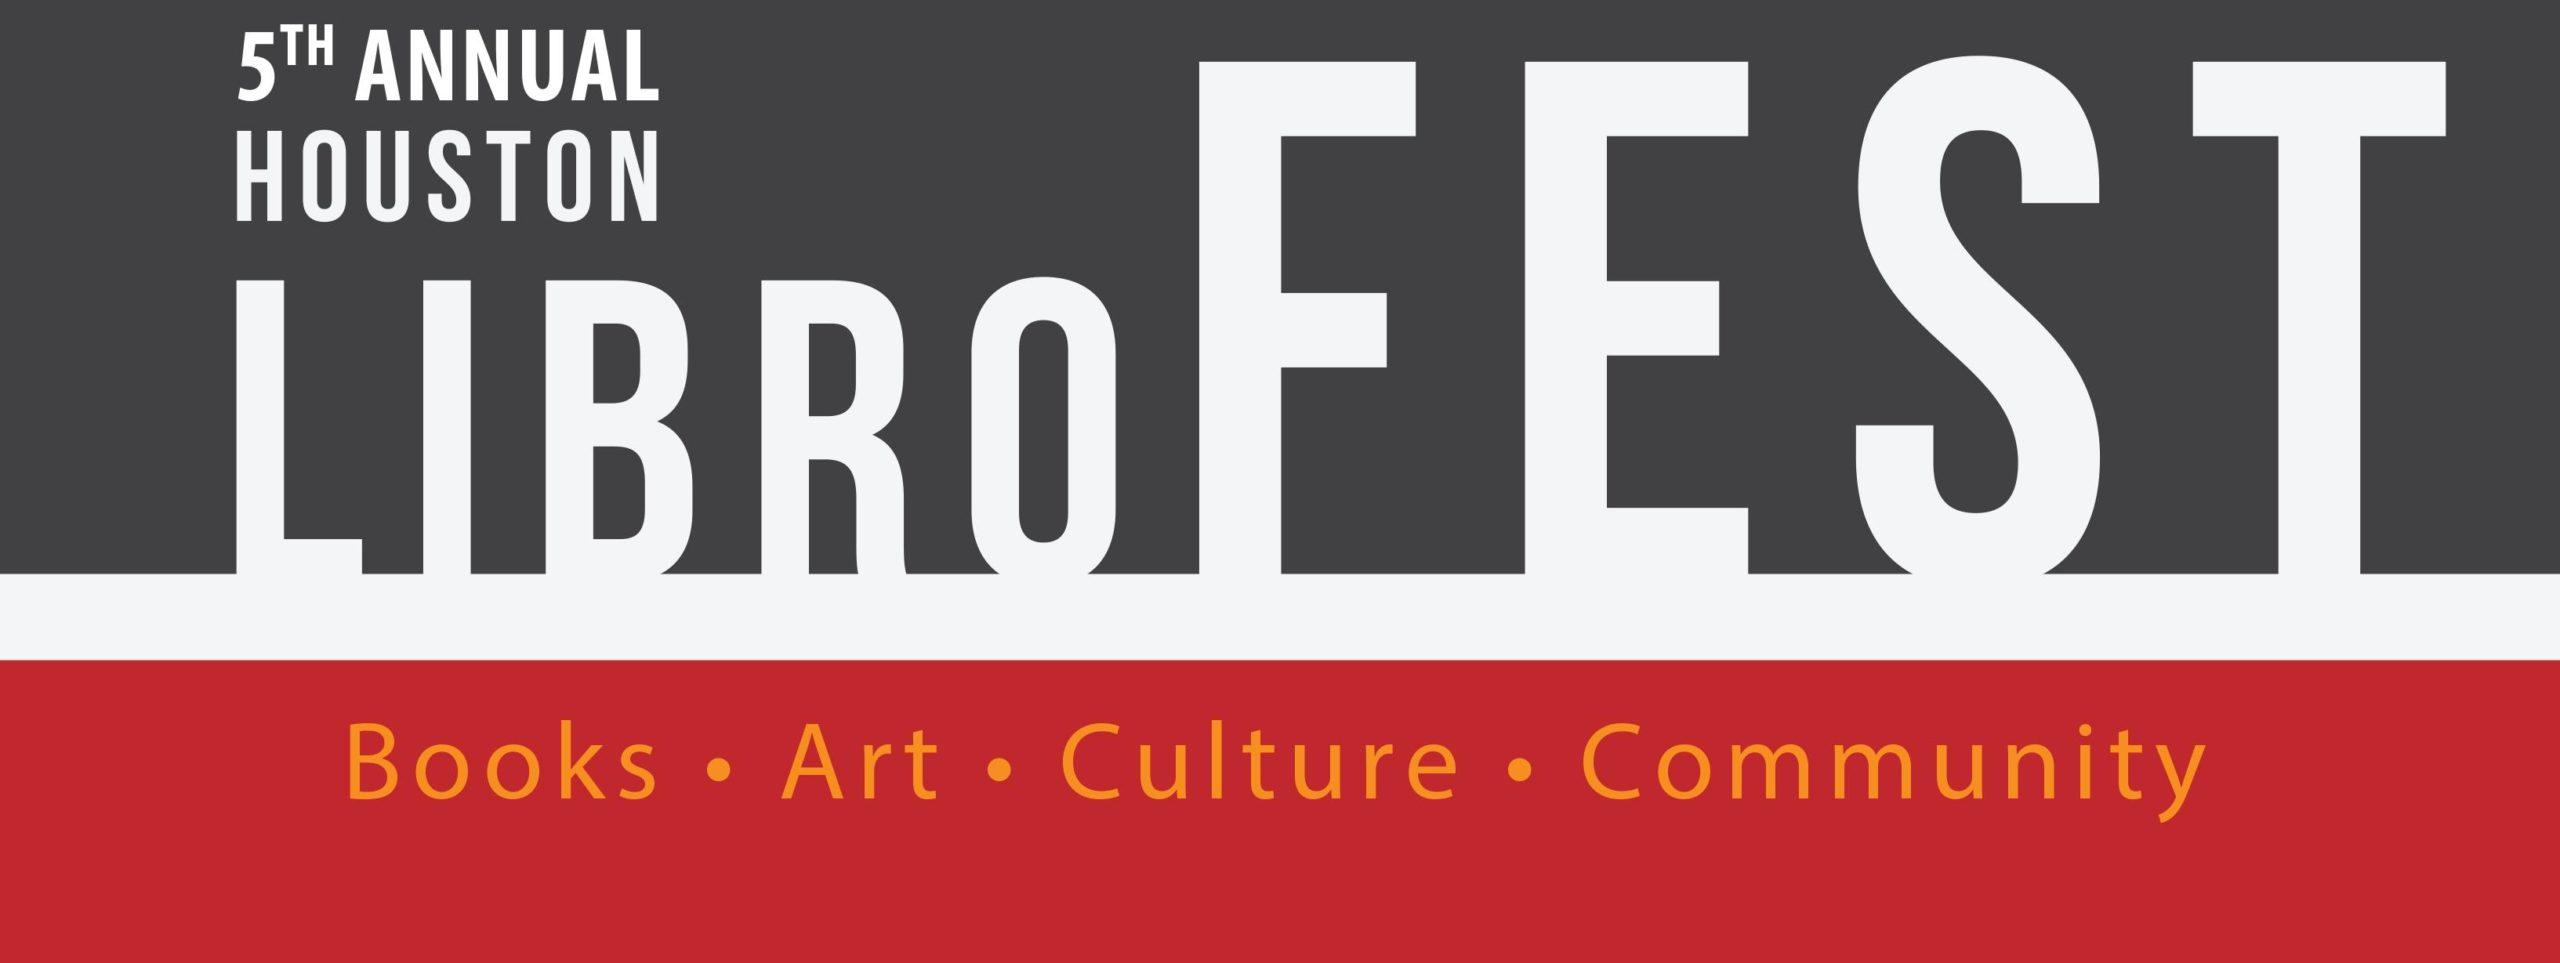 Houston Public Library's LibroFEST on Saturday, October 1, 2016 (hispanichouston.com)